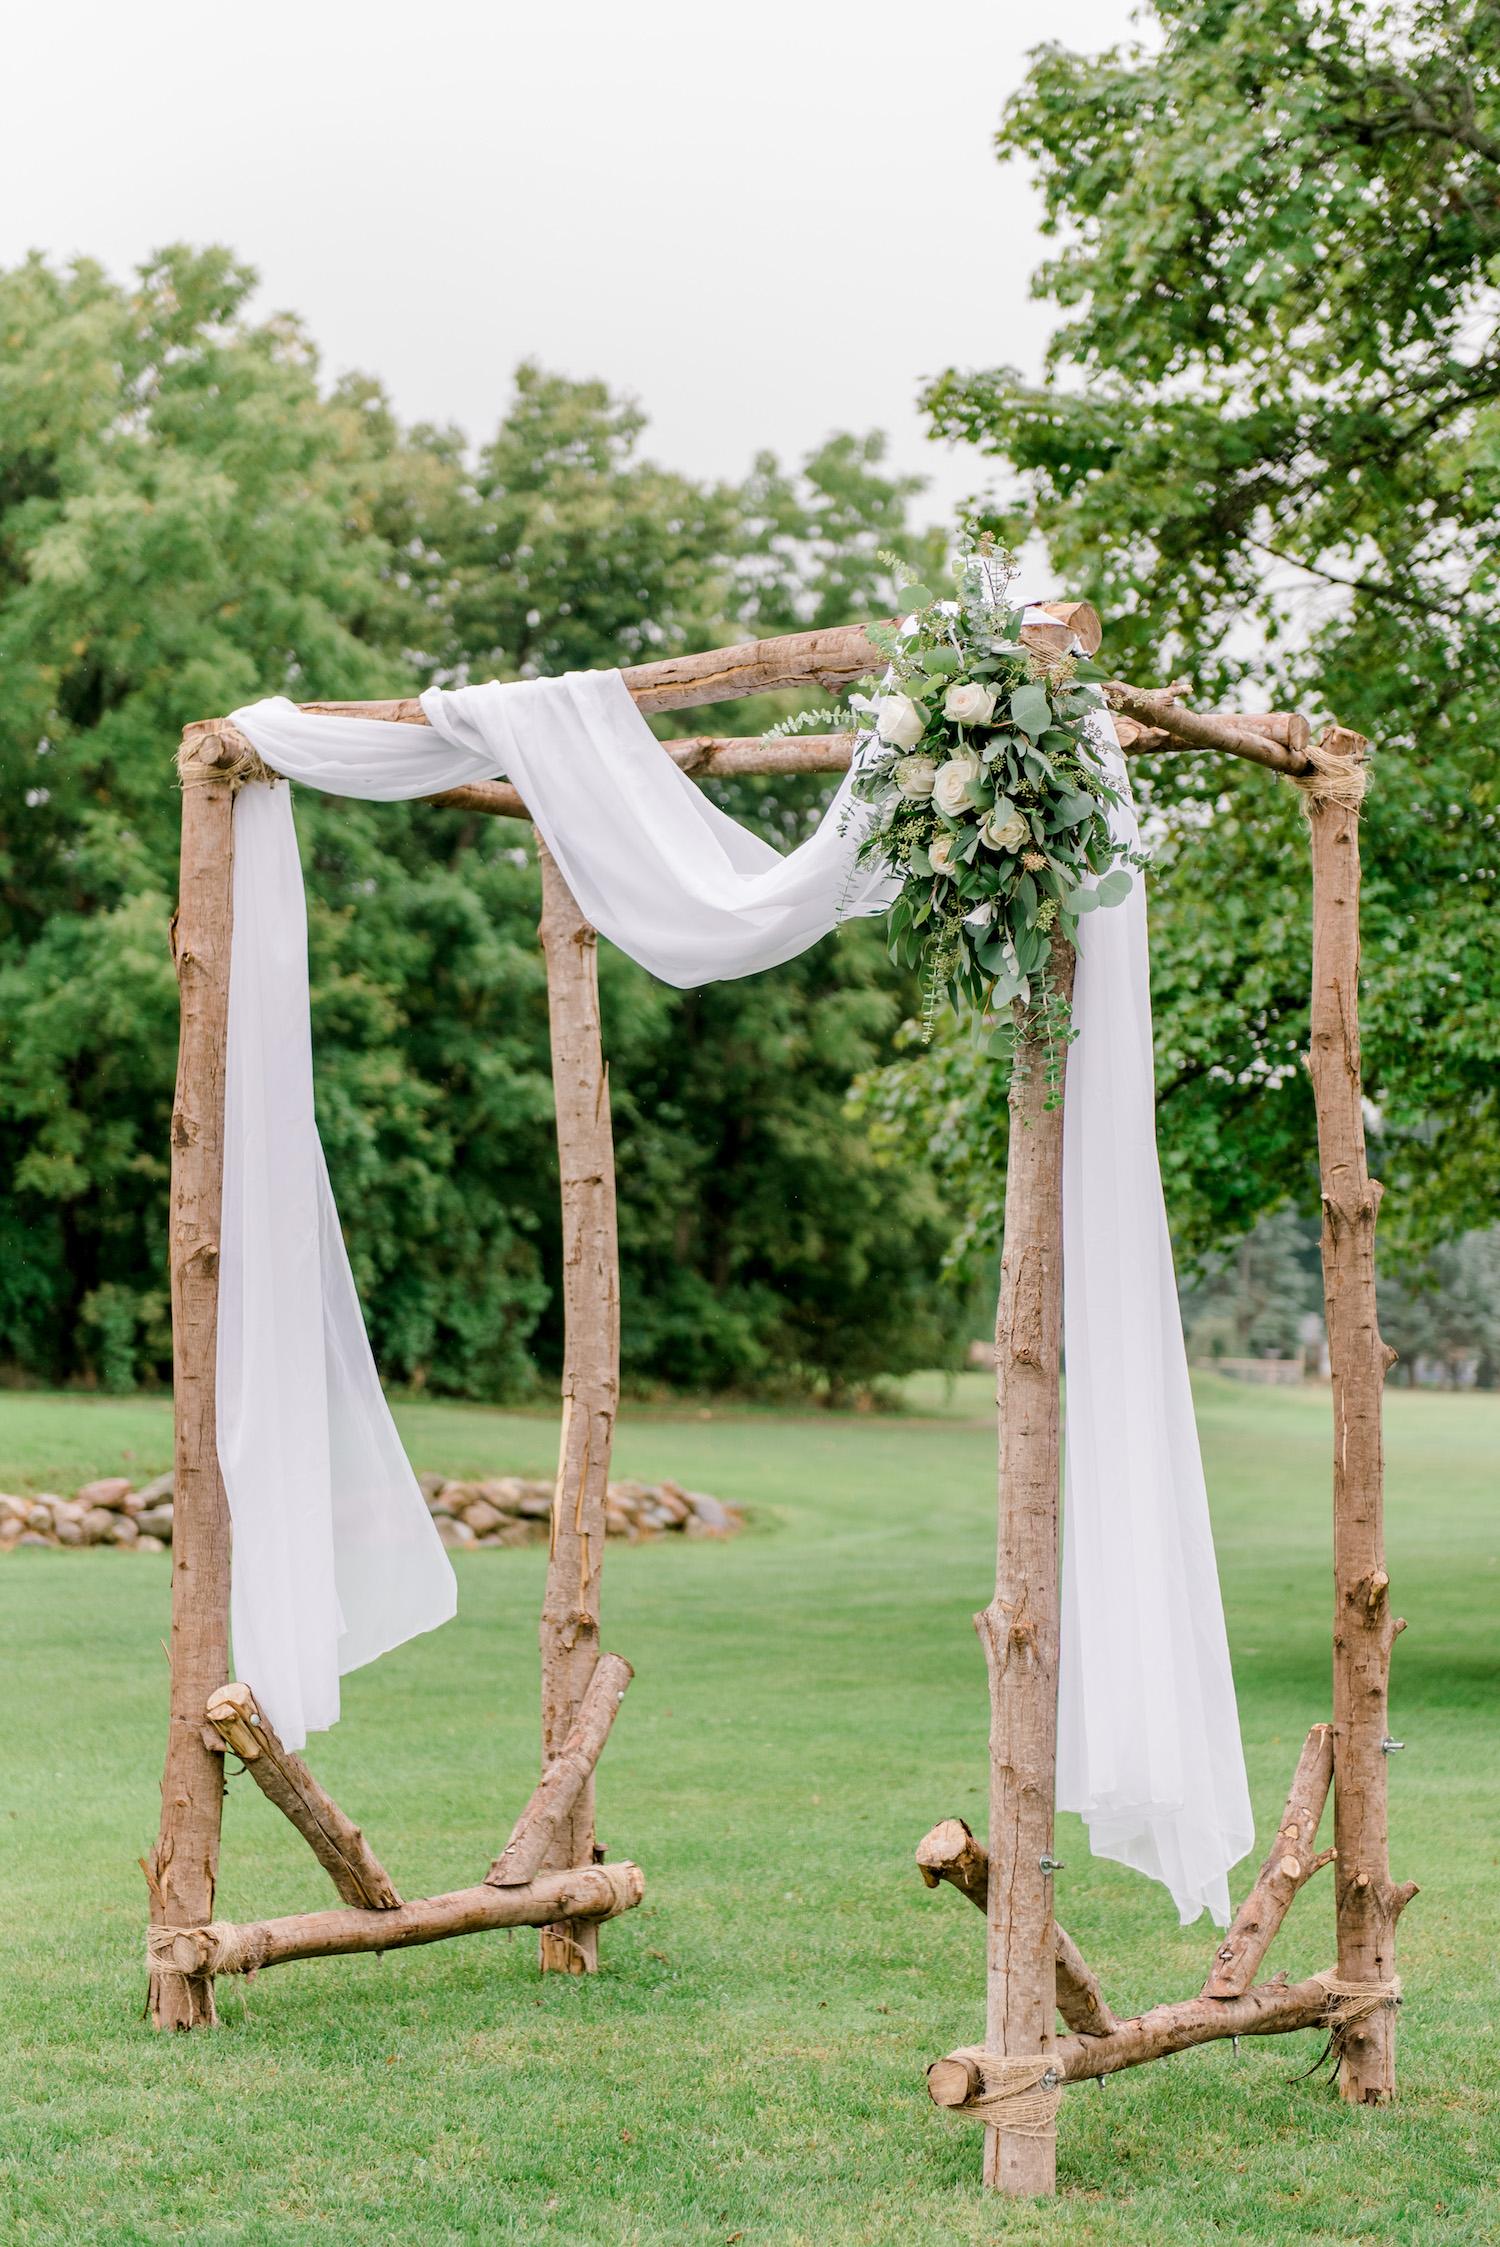 Wallinwood Springs Golf Course wedding arch